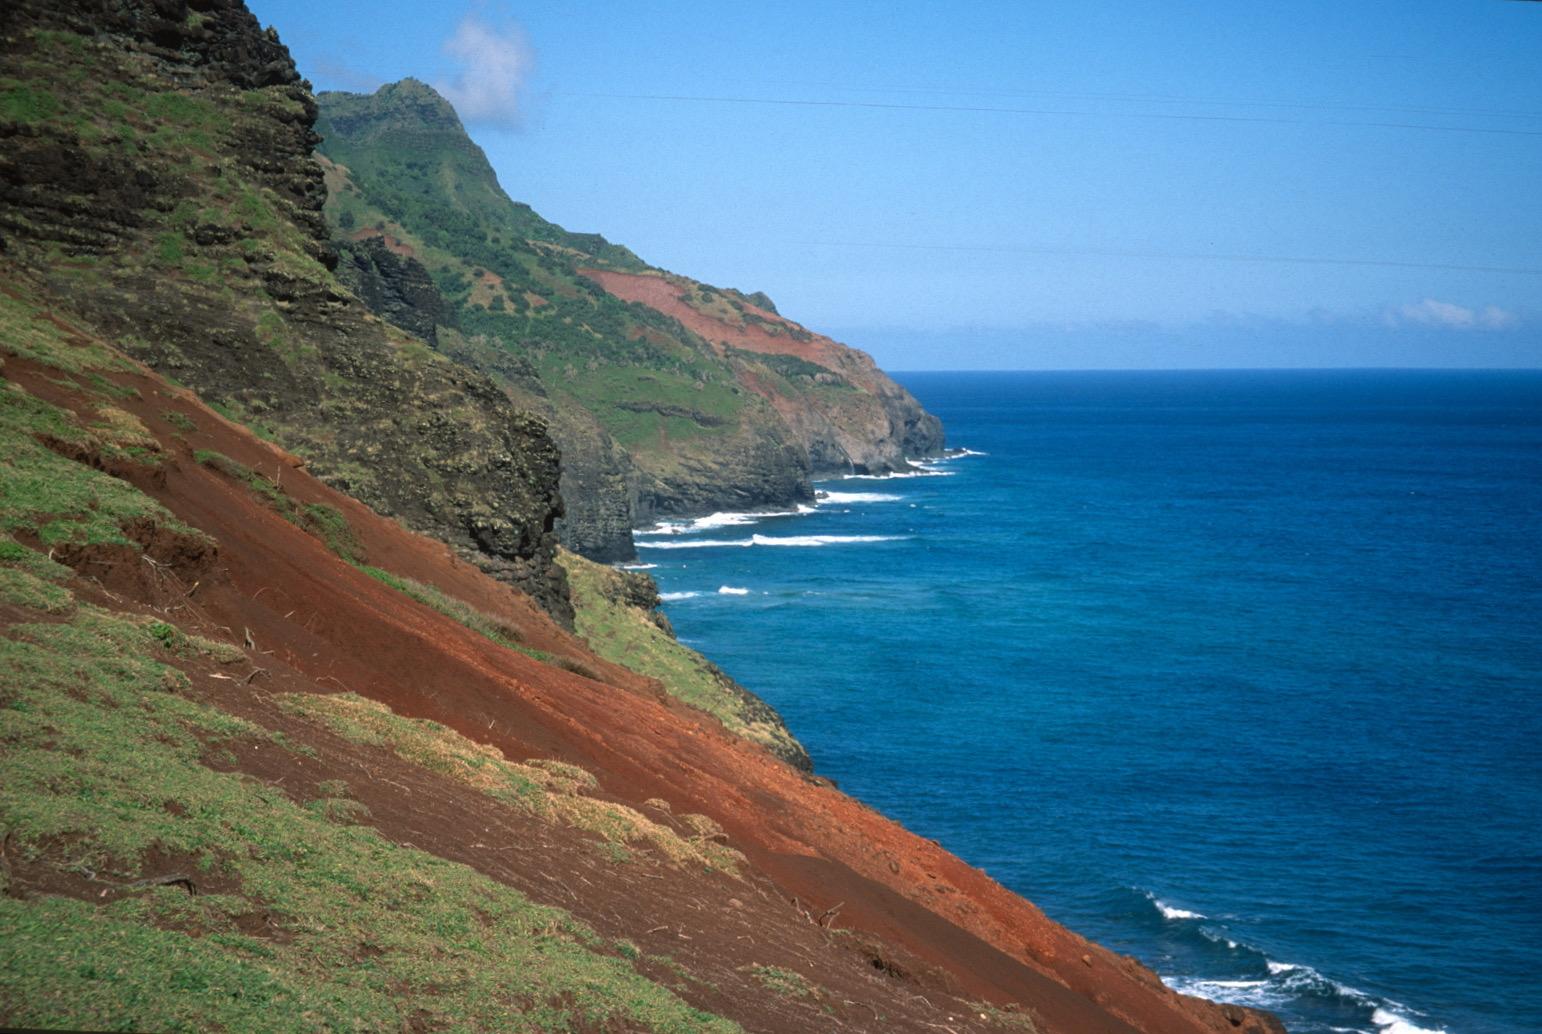 The rocks and soil along the Kalalau Trail reveal the volcanic origin of the Hawaiian Islands.